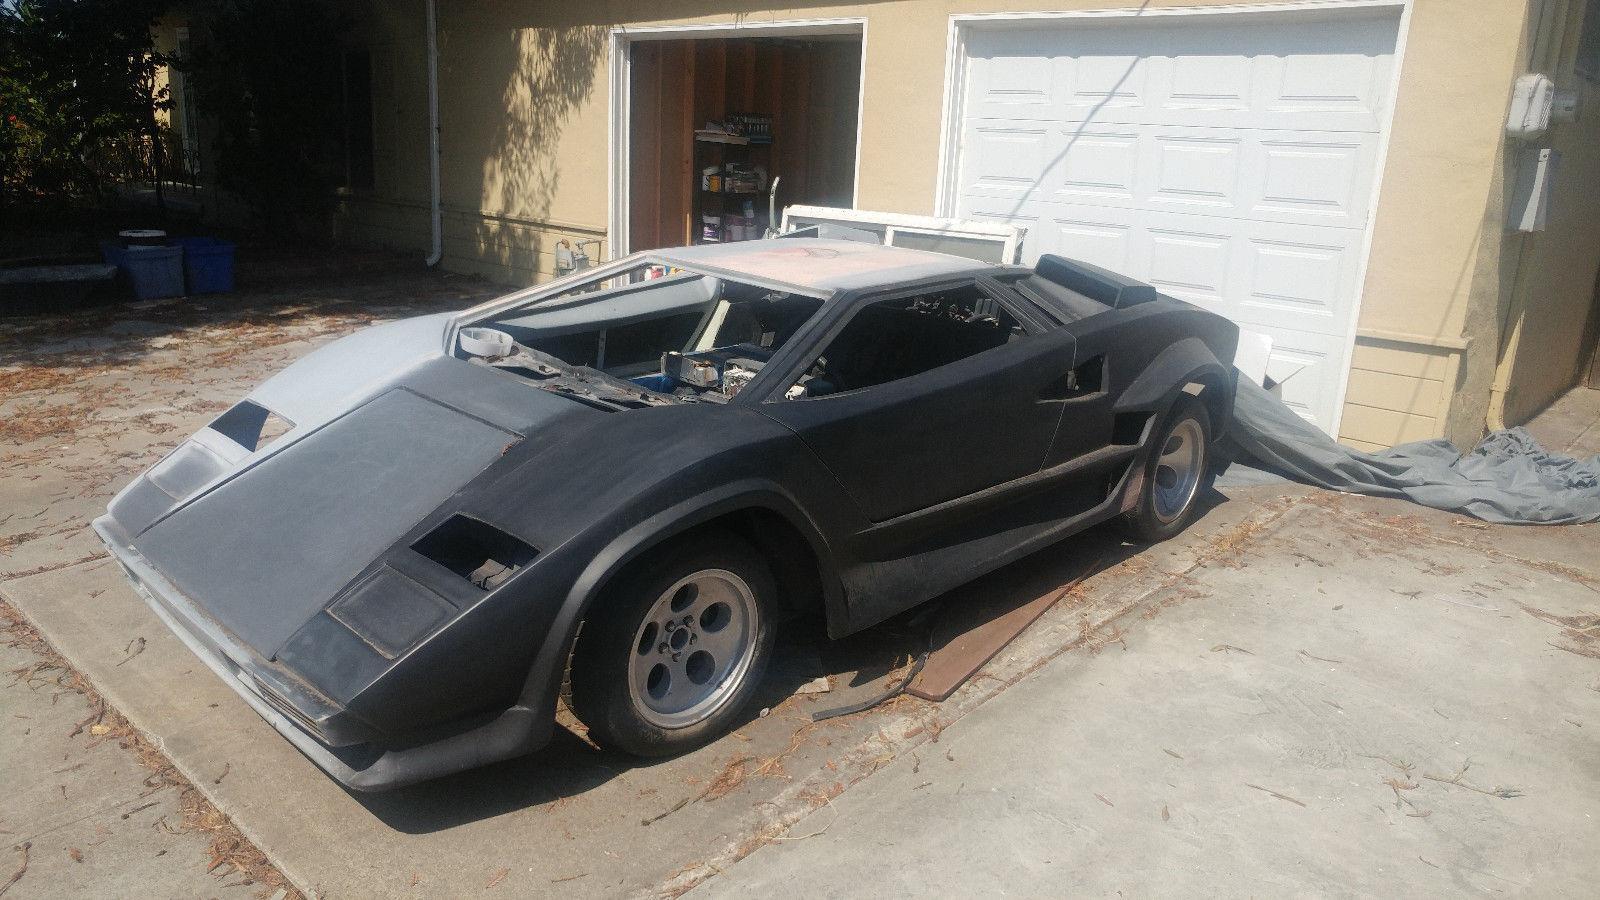 Lamborghini Replica For Sale Craigslist Lamborghini Super Car